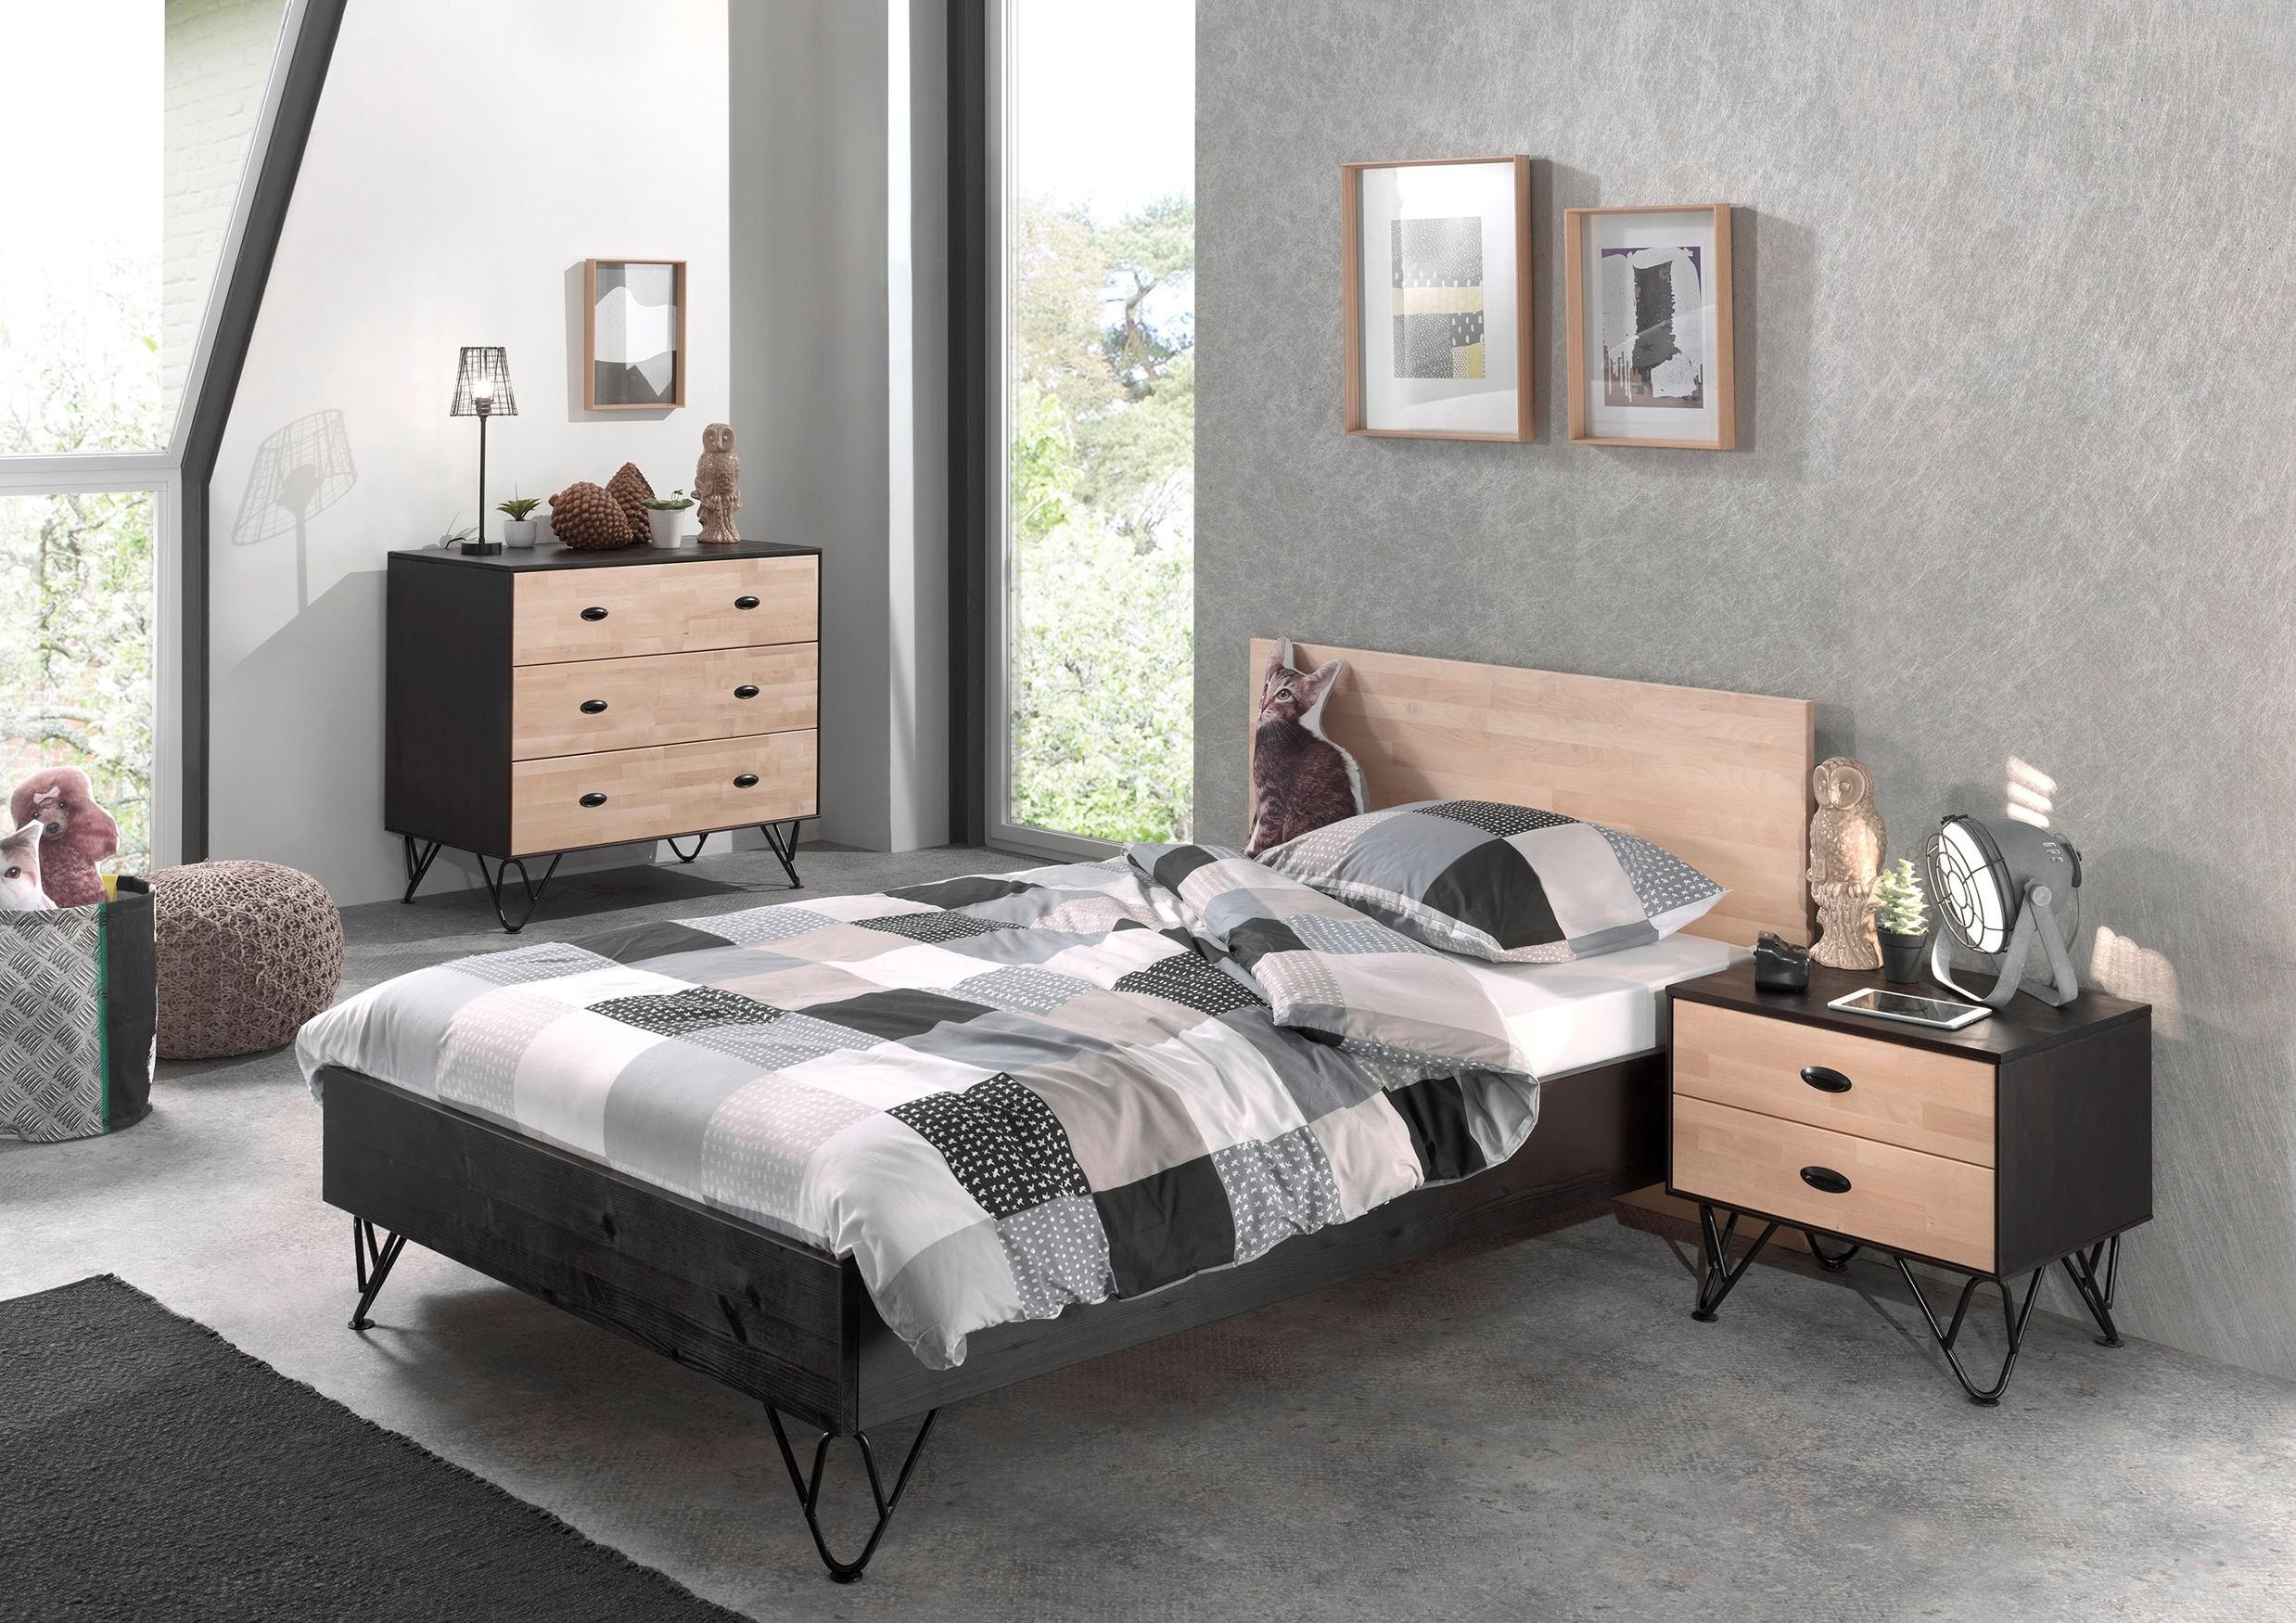 Jugendzimmer Bett 120×200